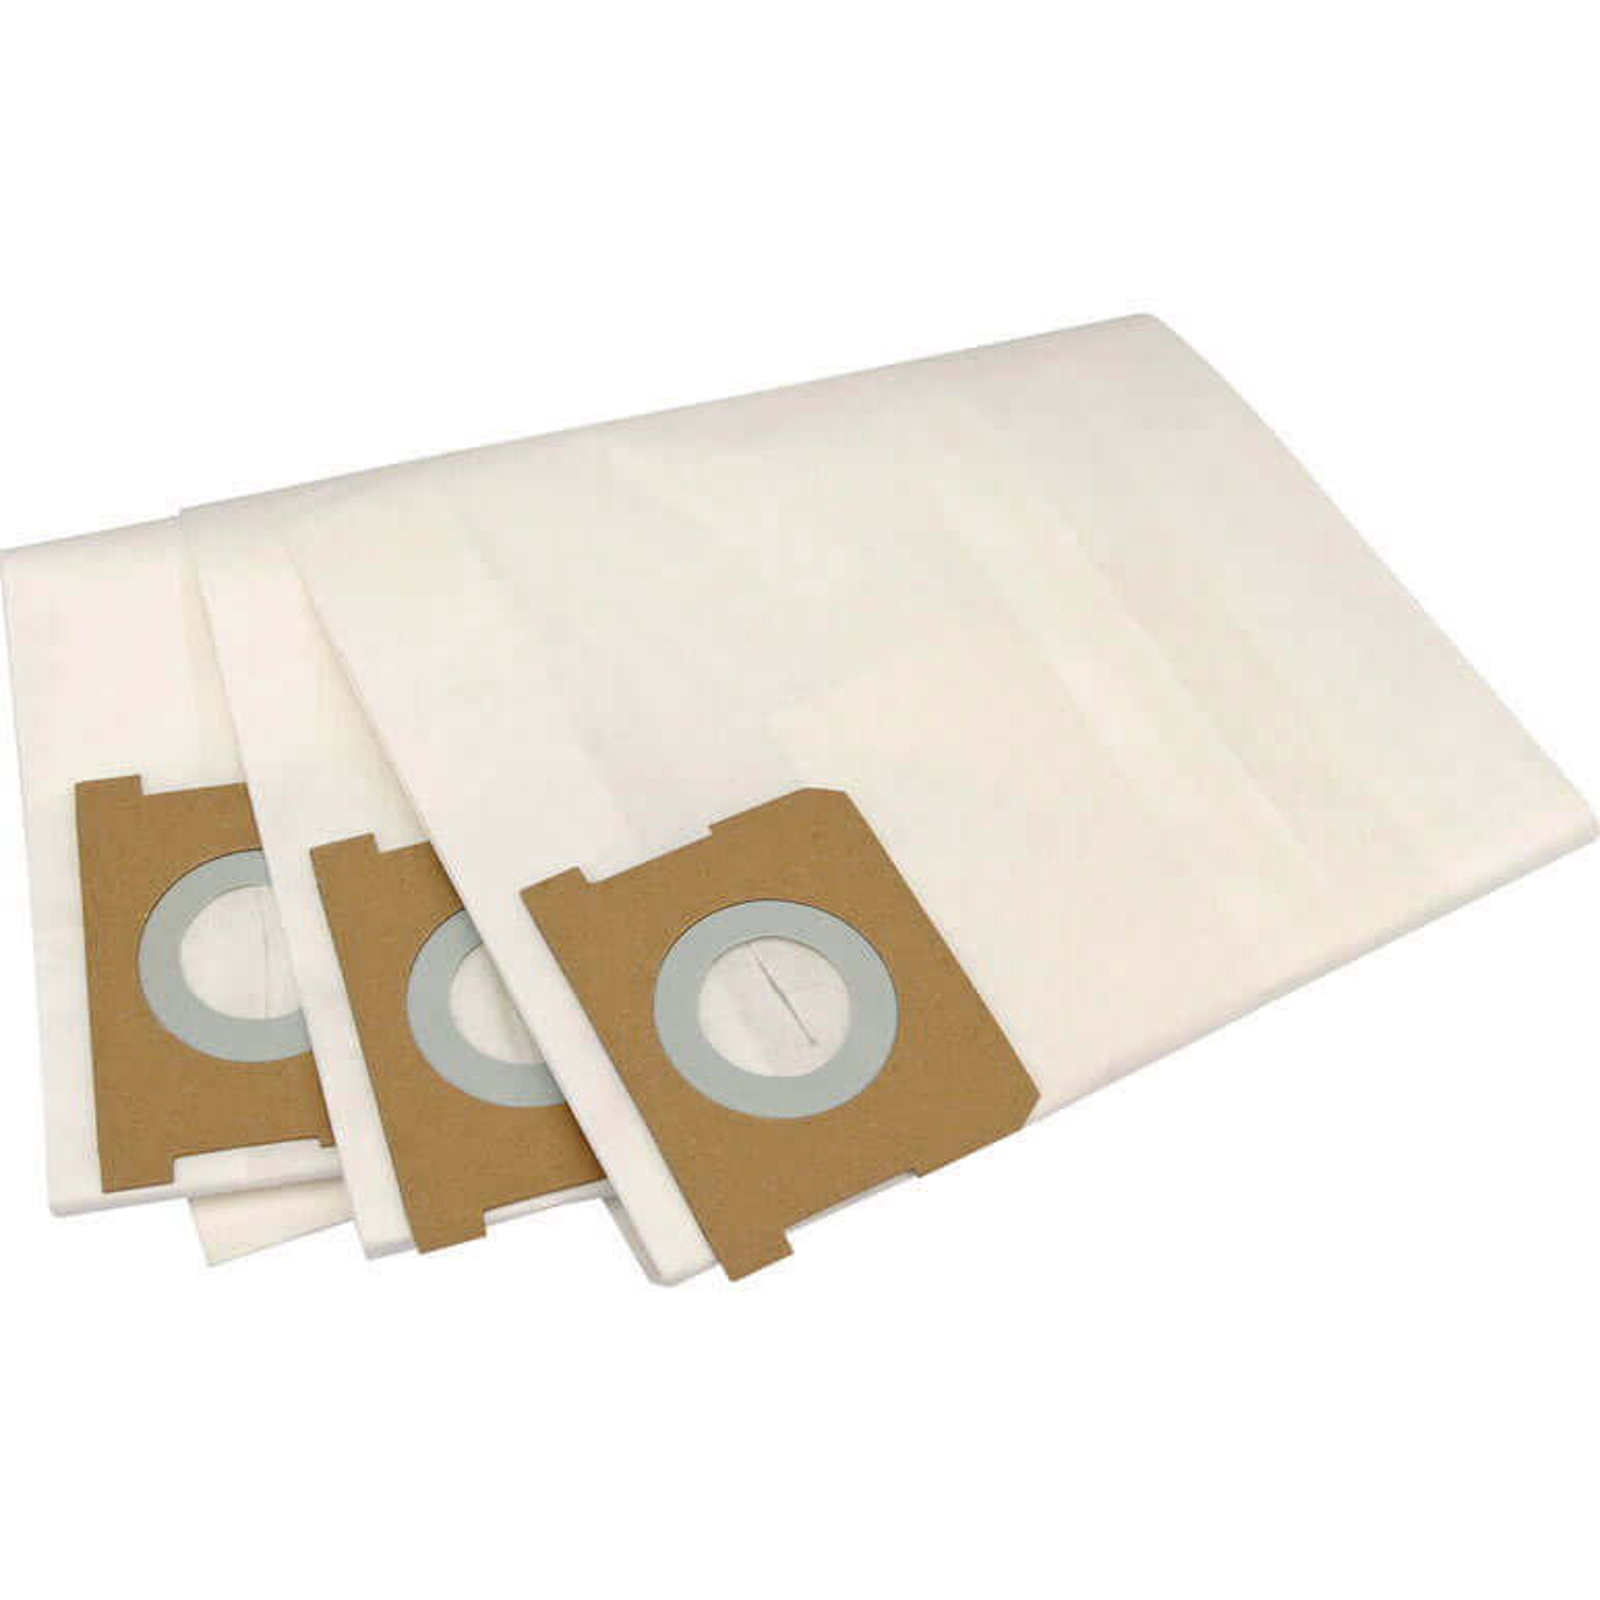 Draper Dust Bag for 36313 Vacuum Cleaner